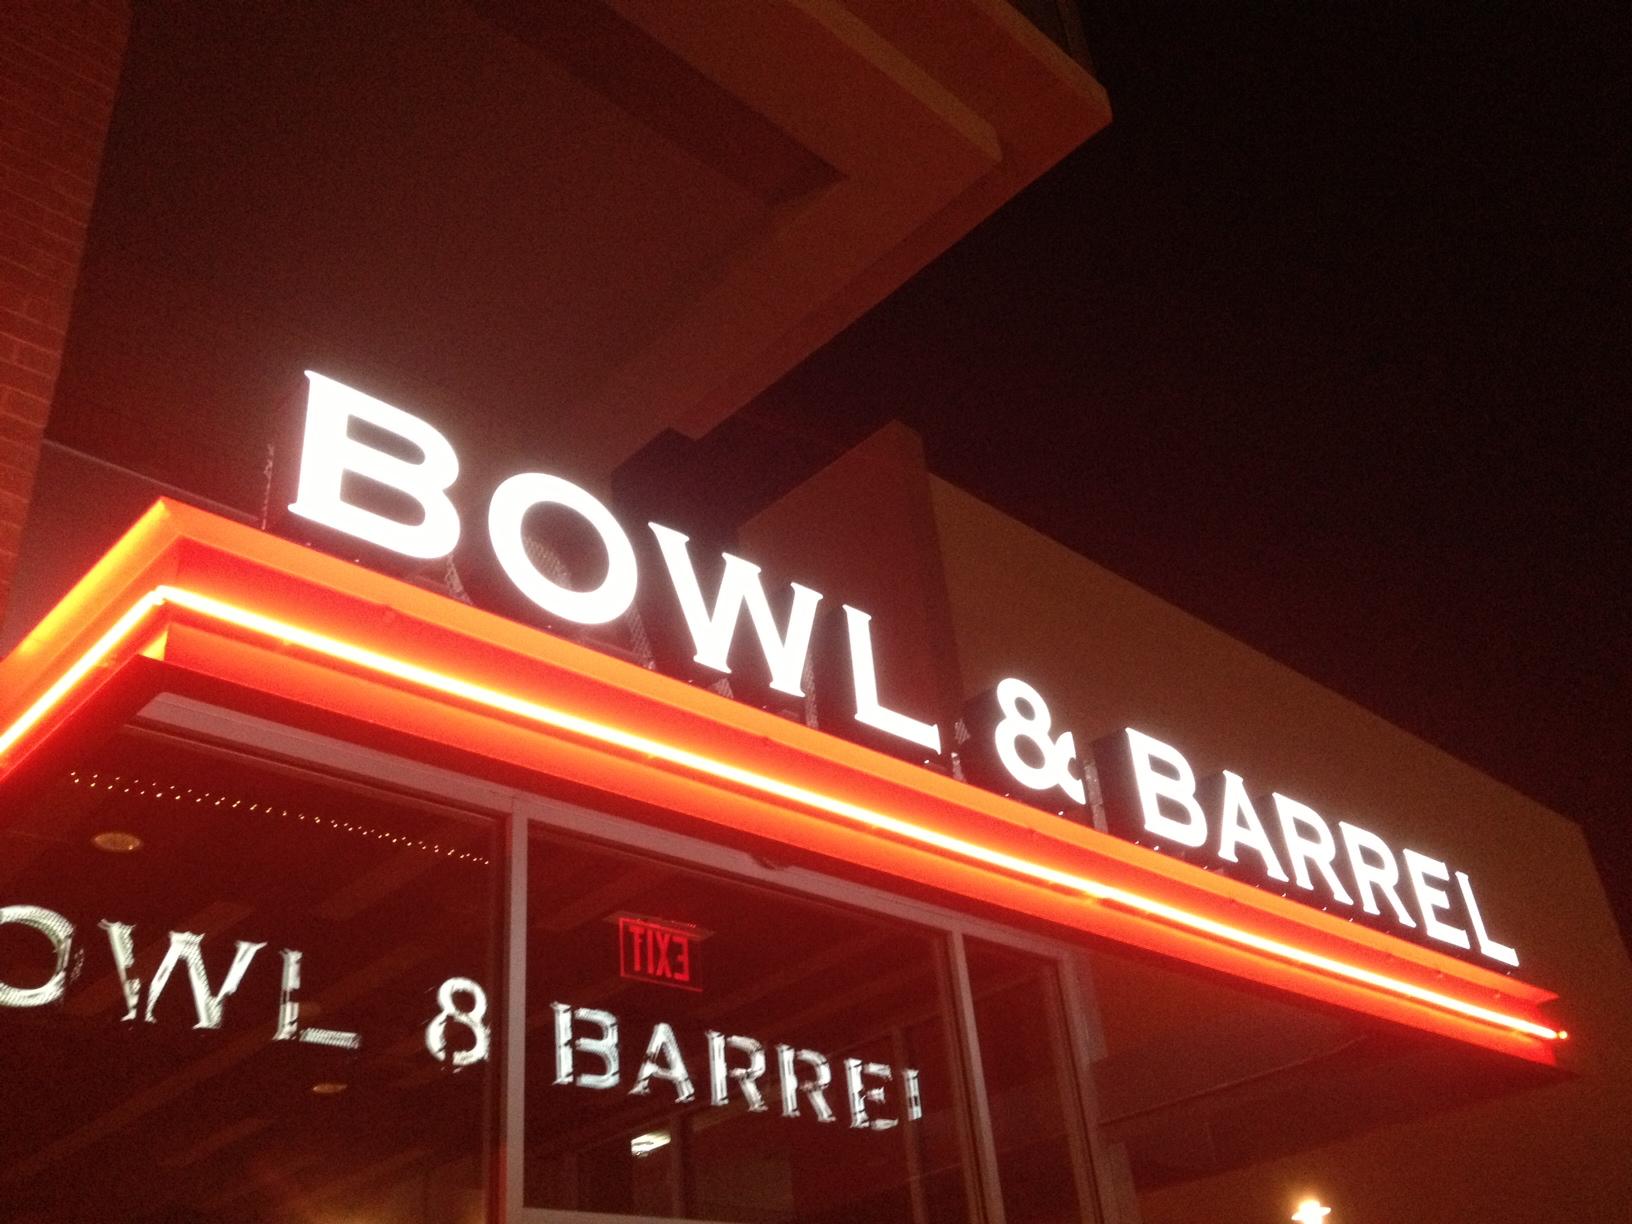 Bowl & Barrel signage